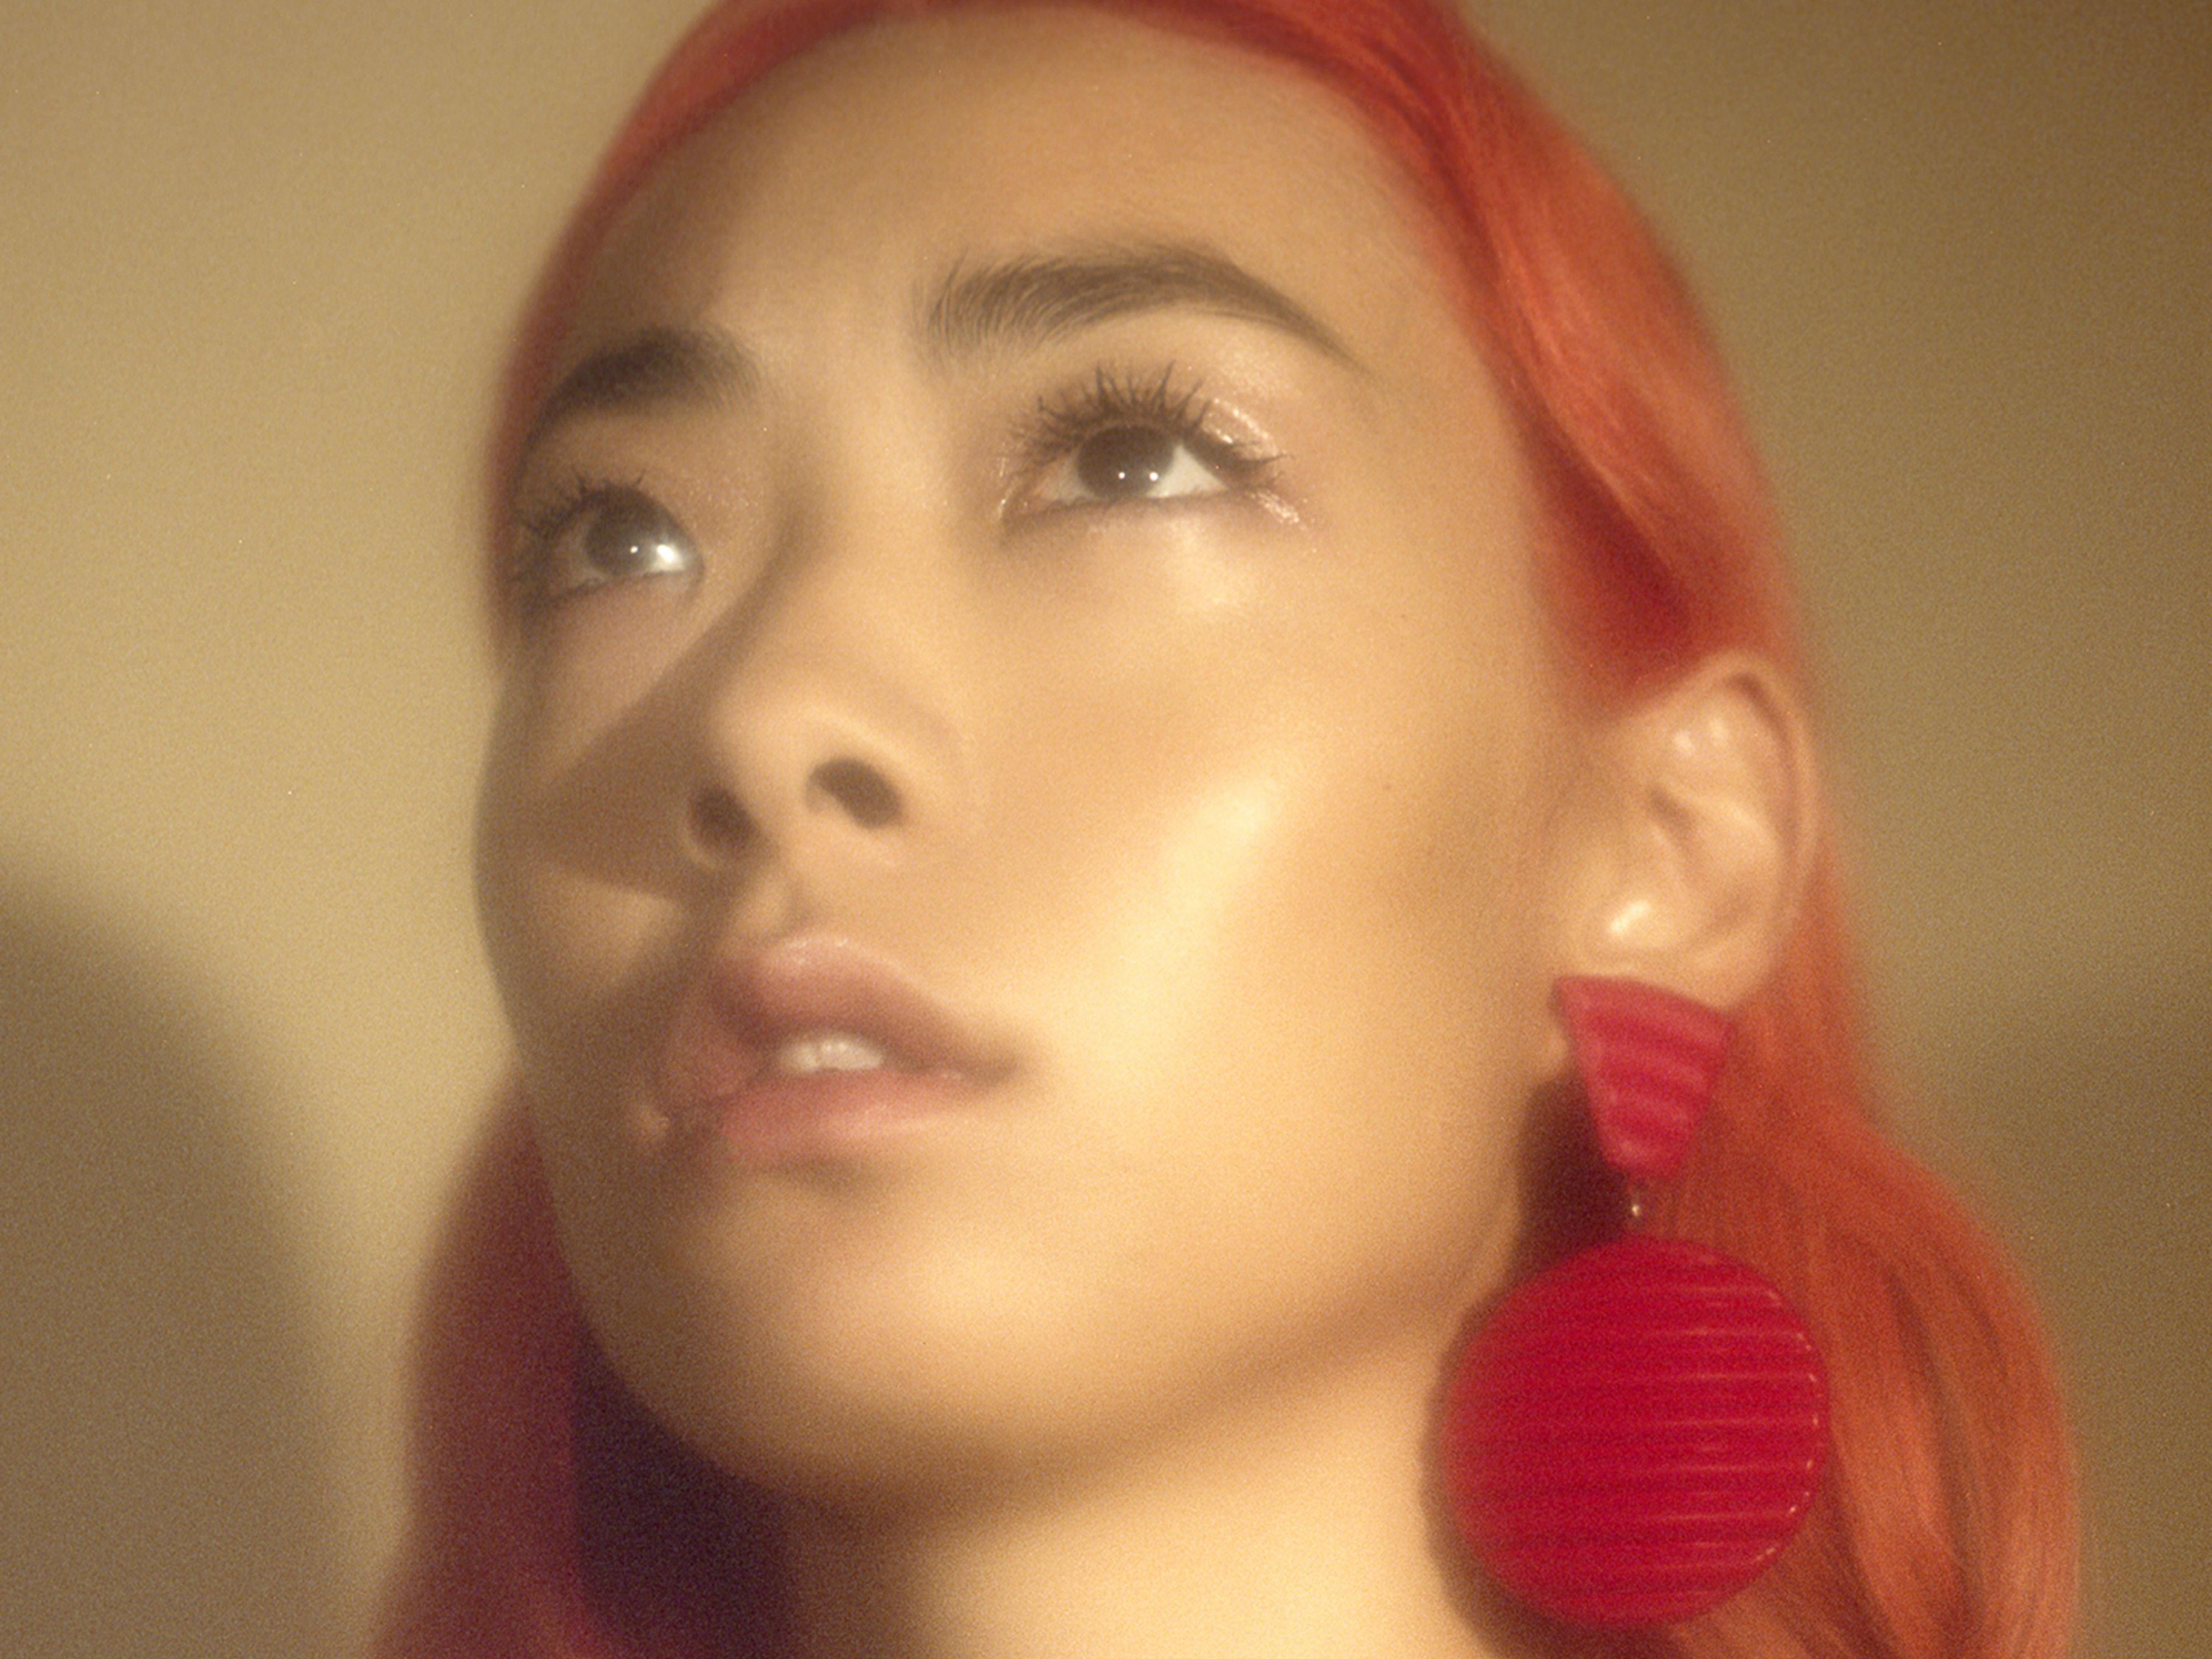 Rina Sawayama teams up with Shamir on 'Tunnel Vision'